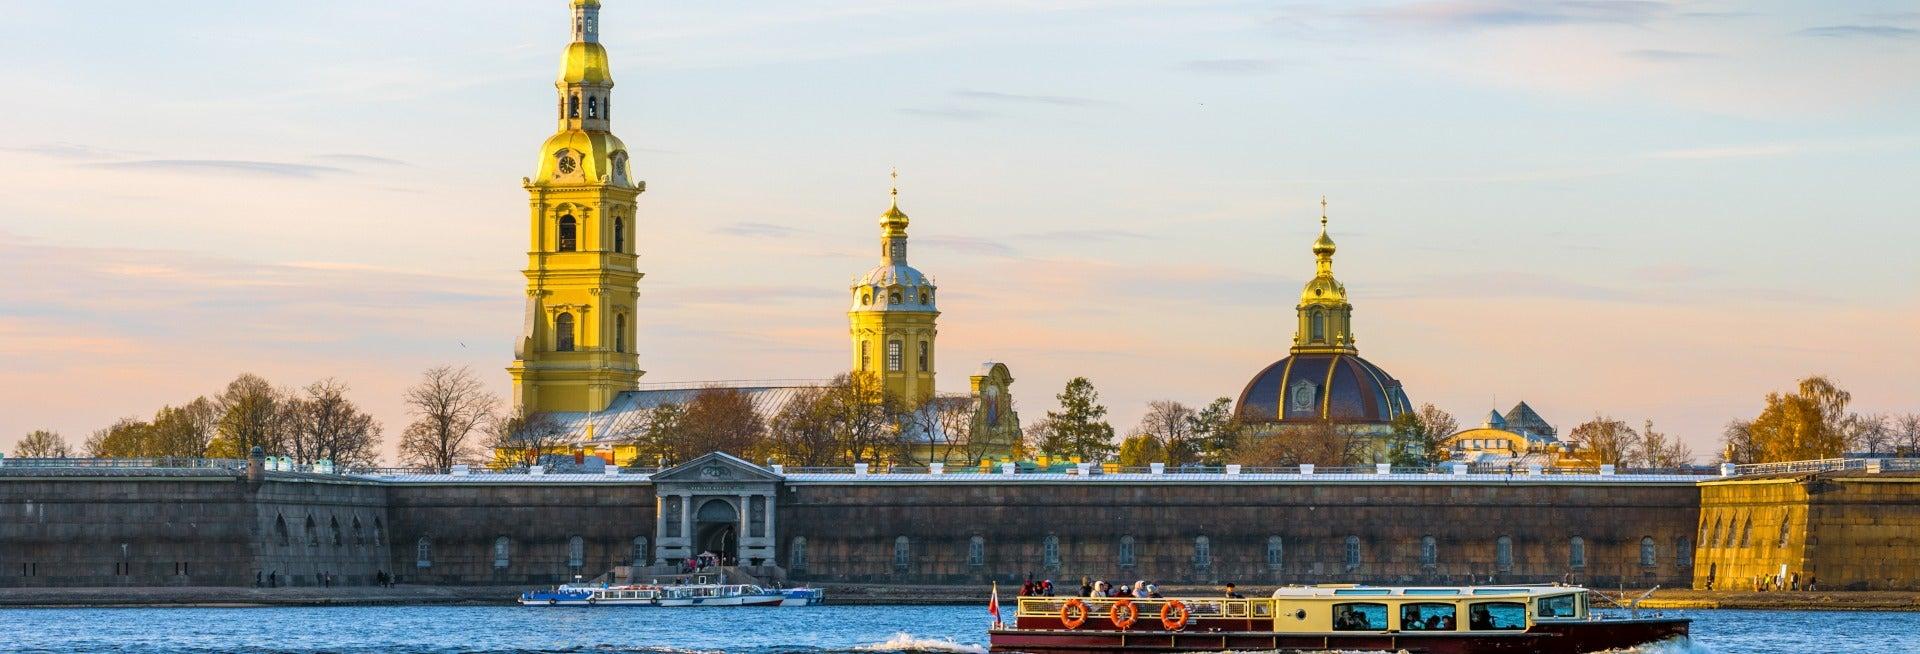 Tour de los Románov por San Petersburgo